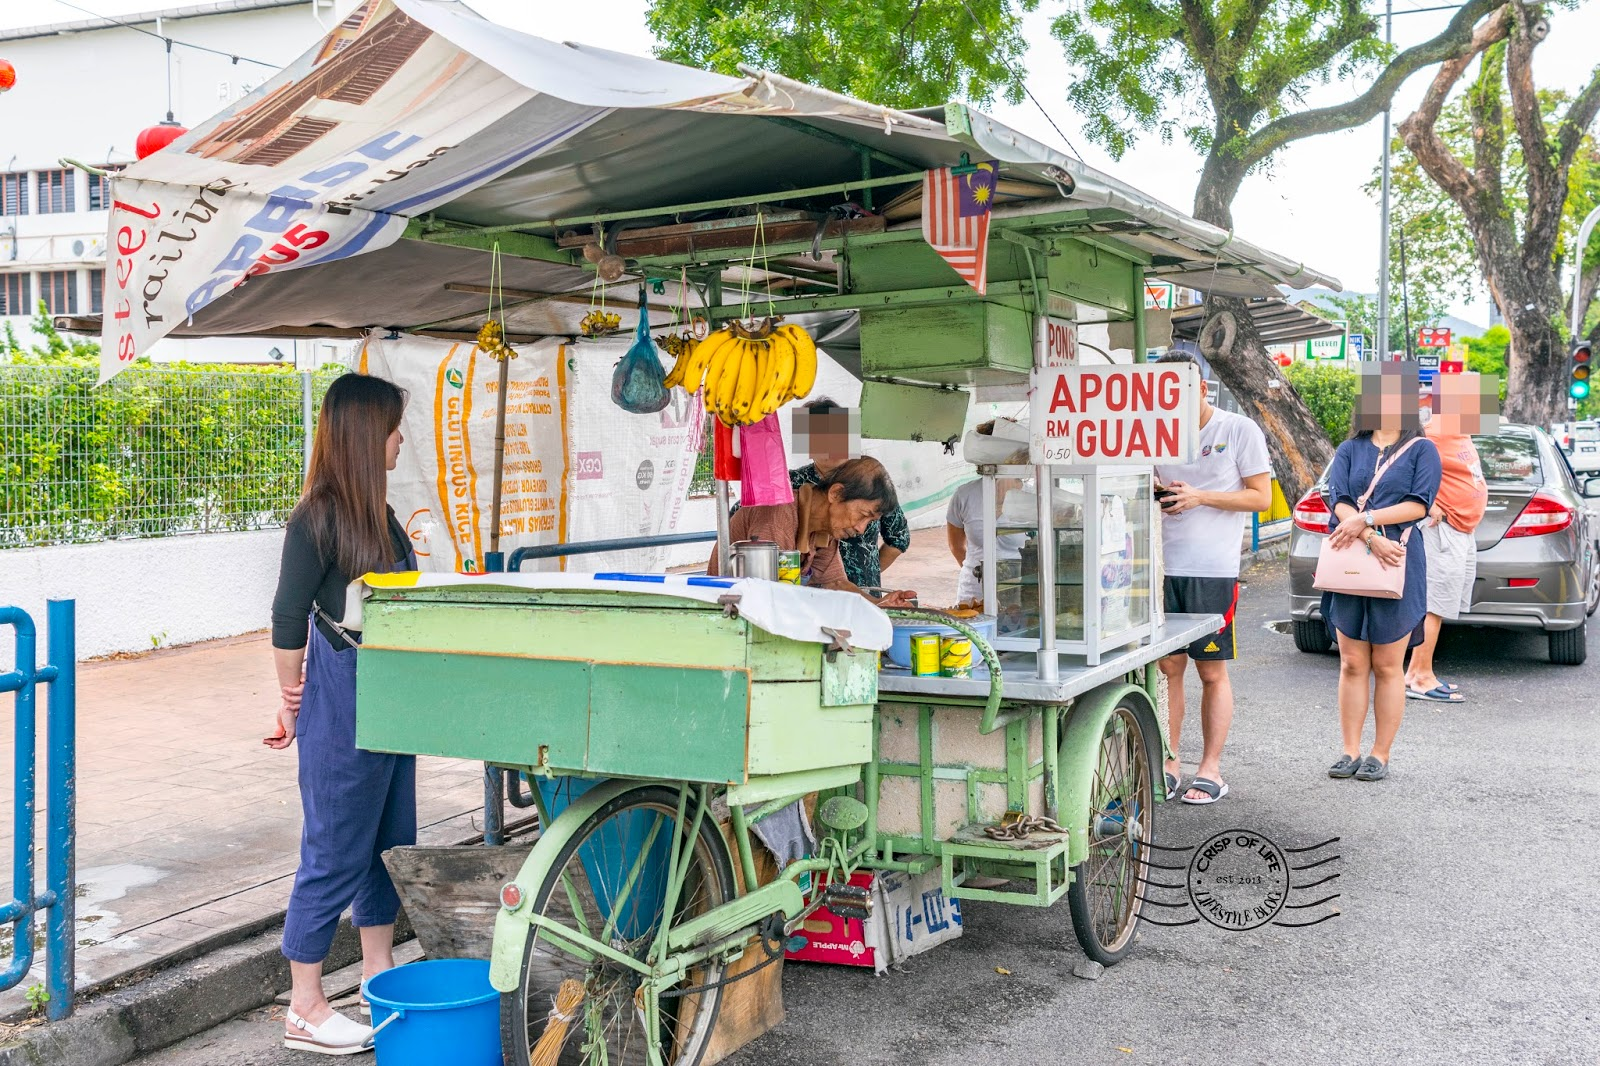 Apong Guan